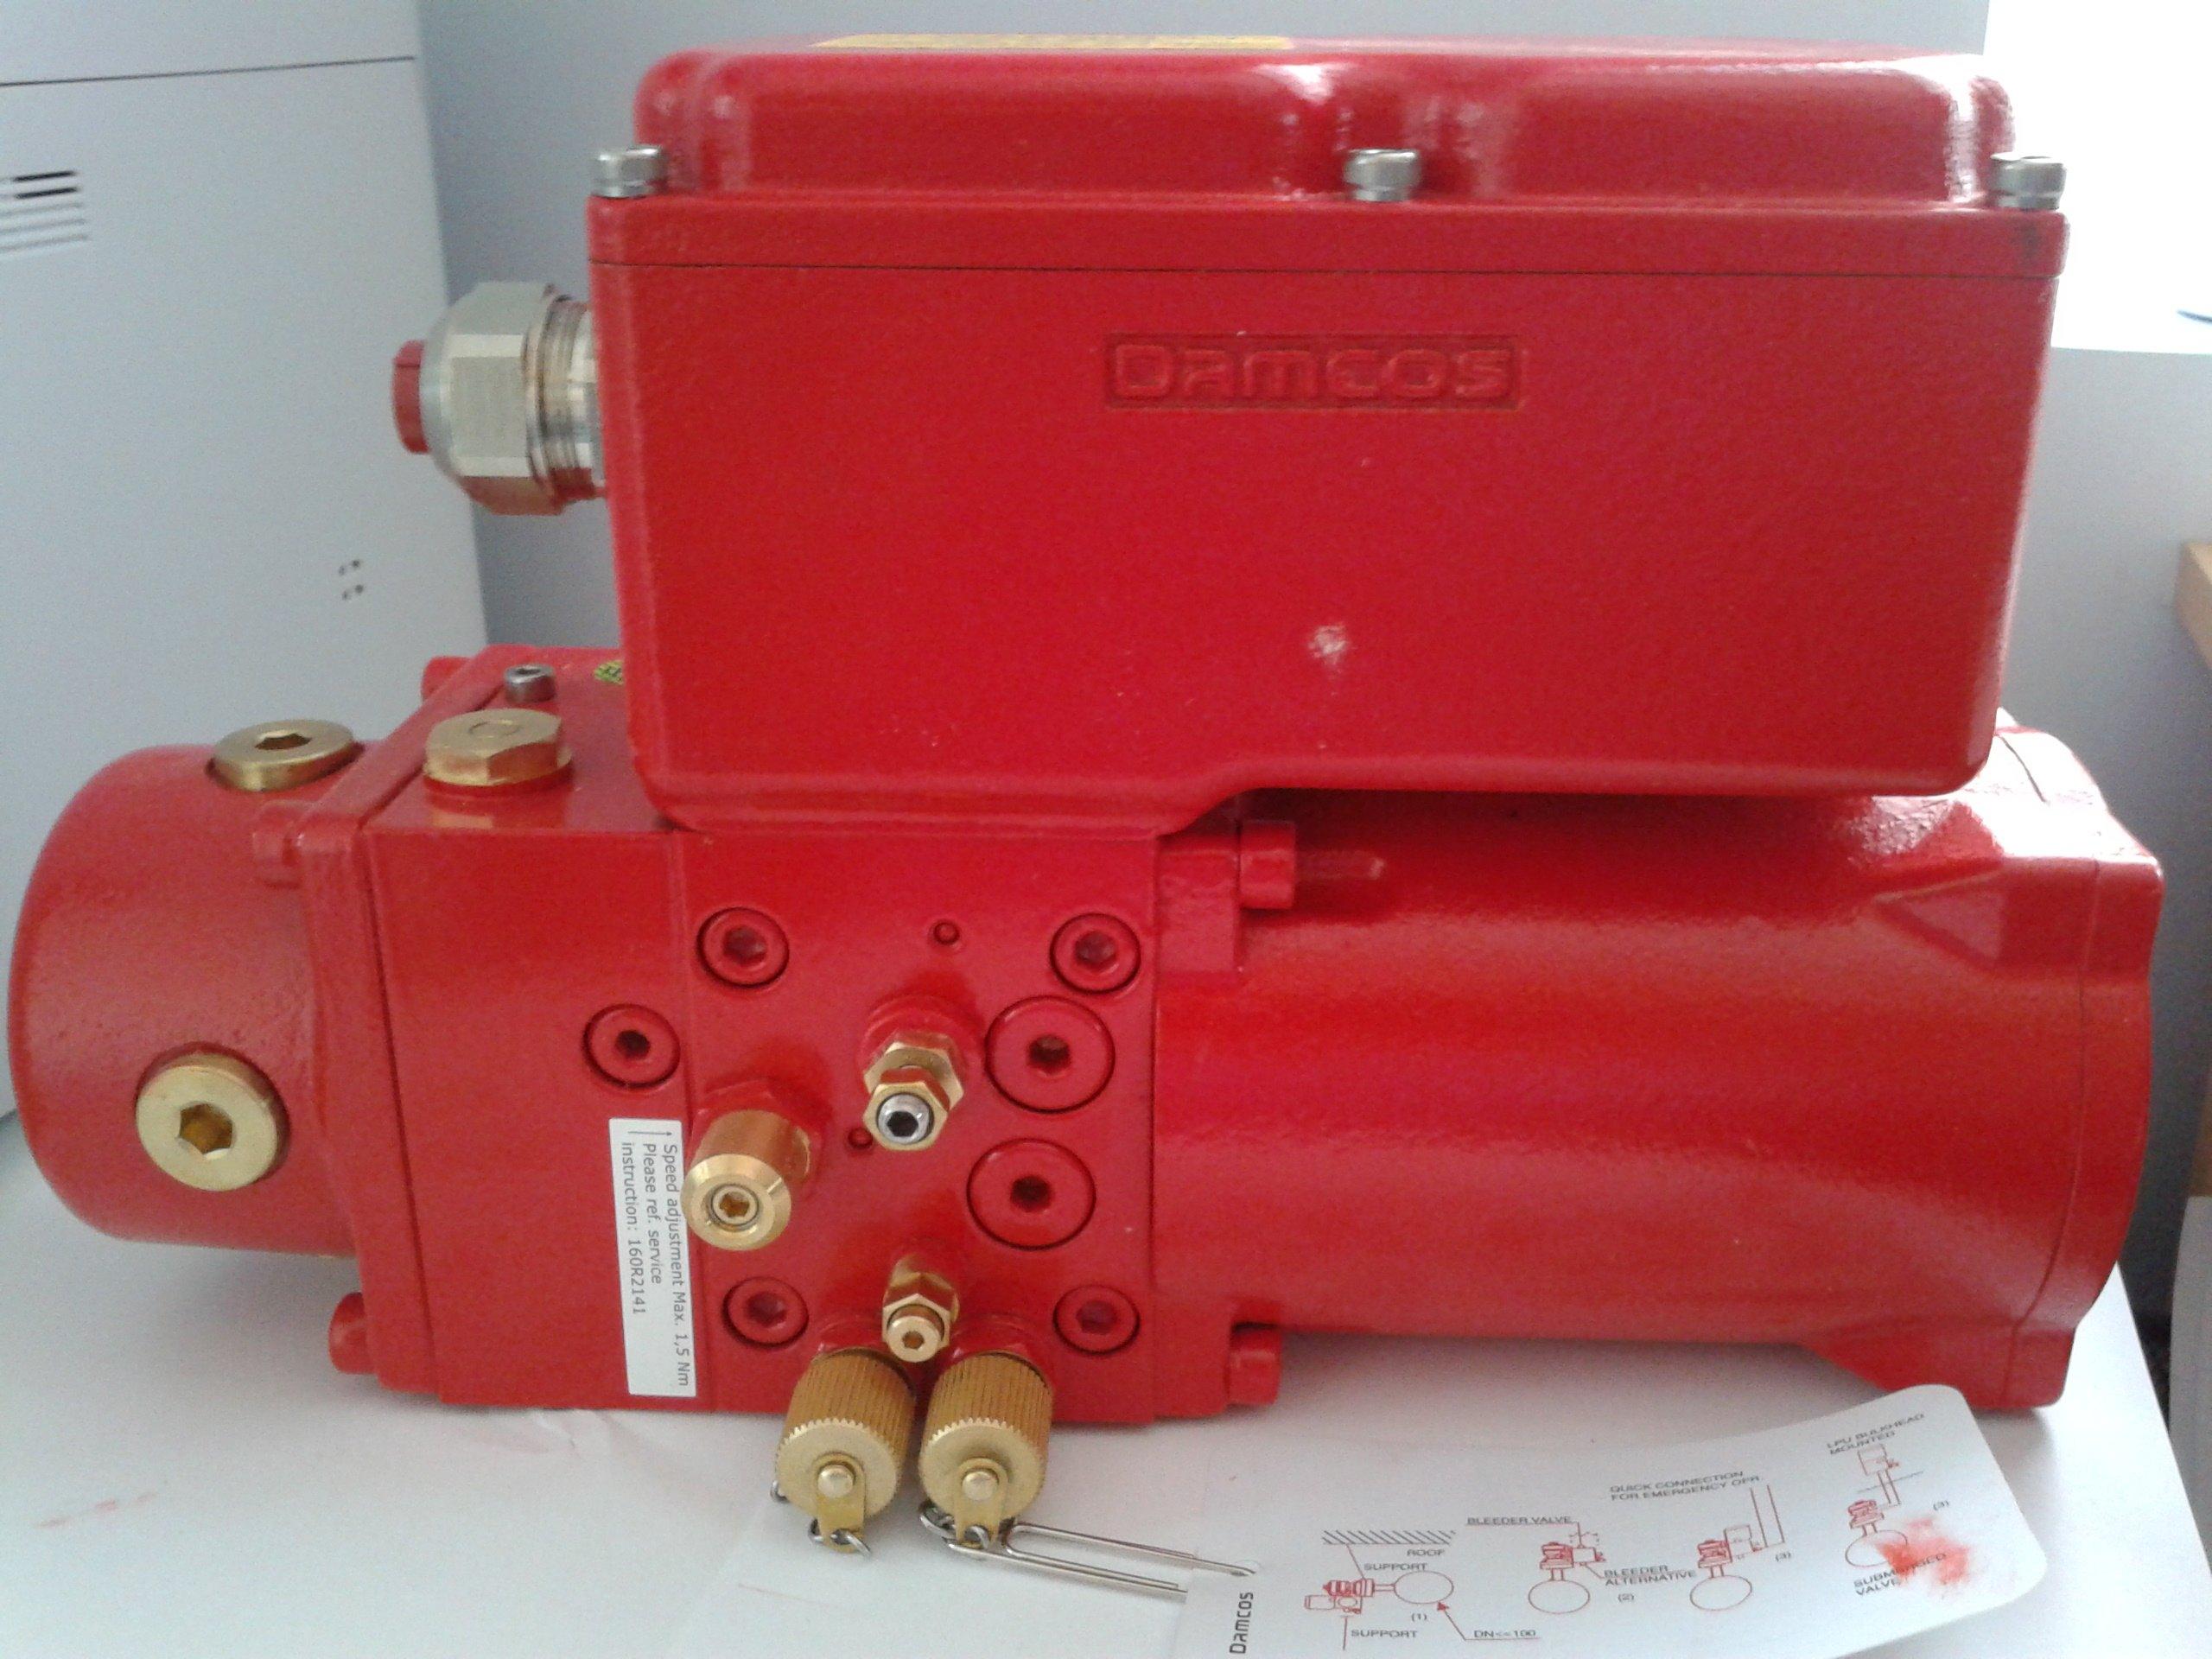 Damcos LPU-S 160G4150 pic 3